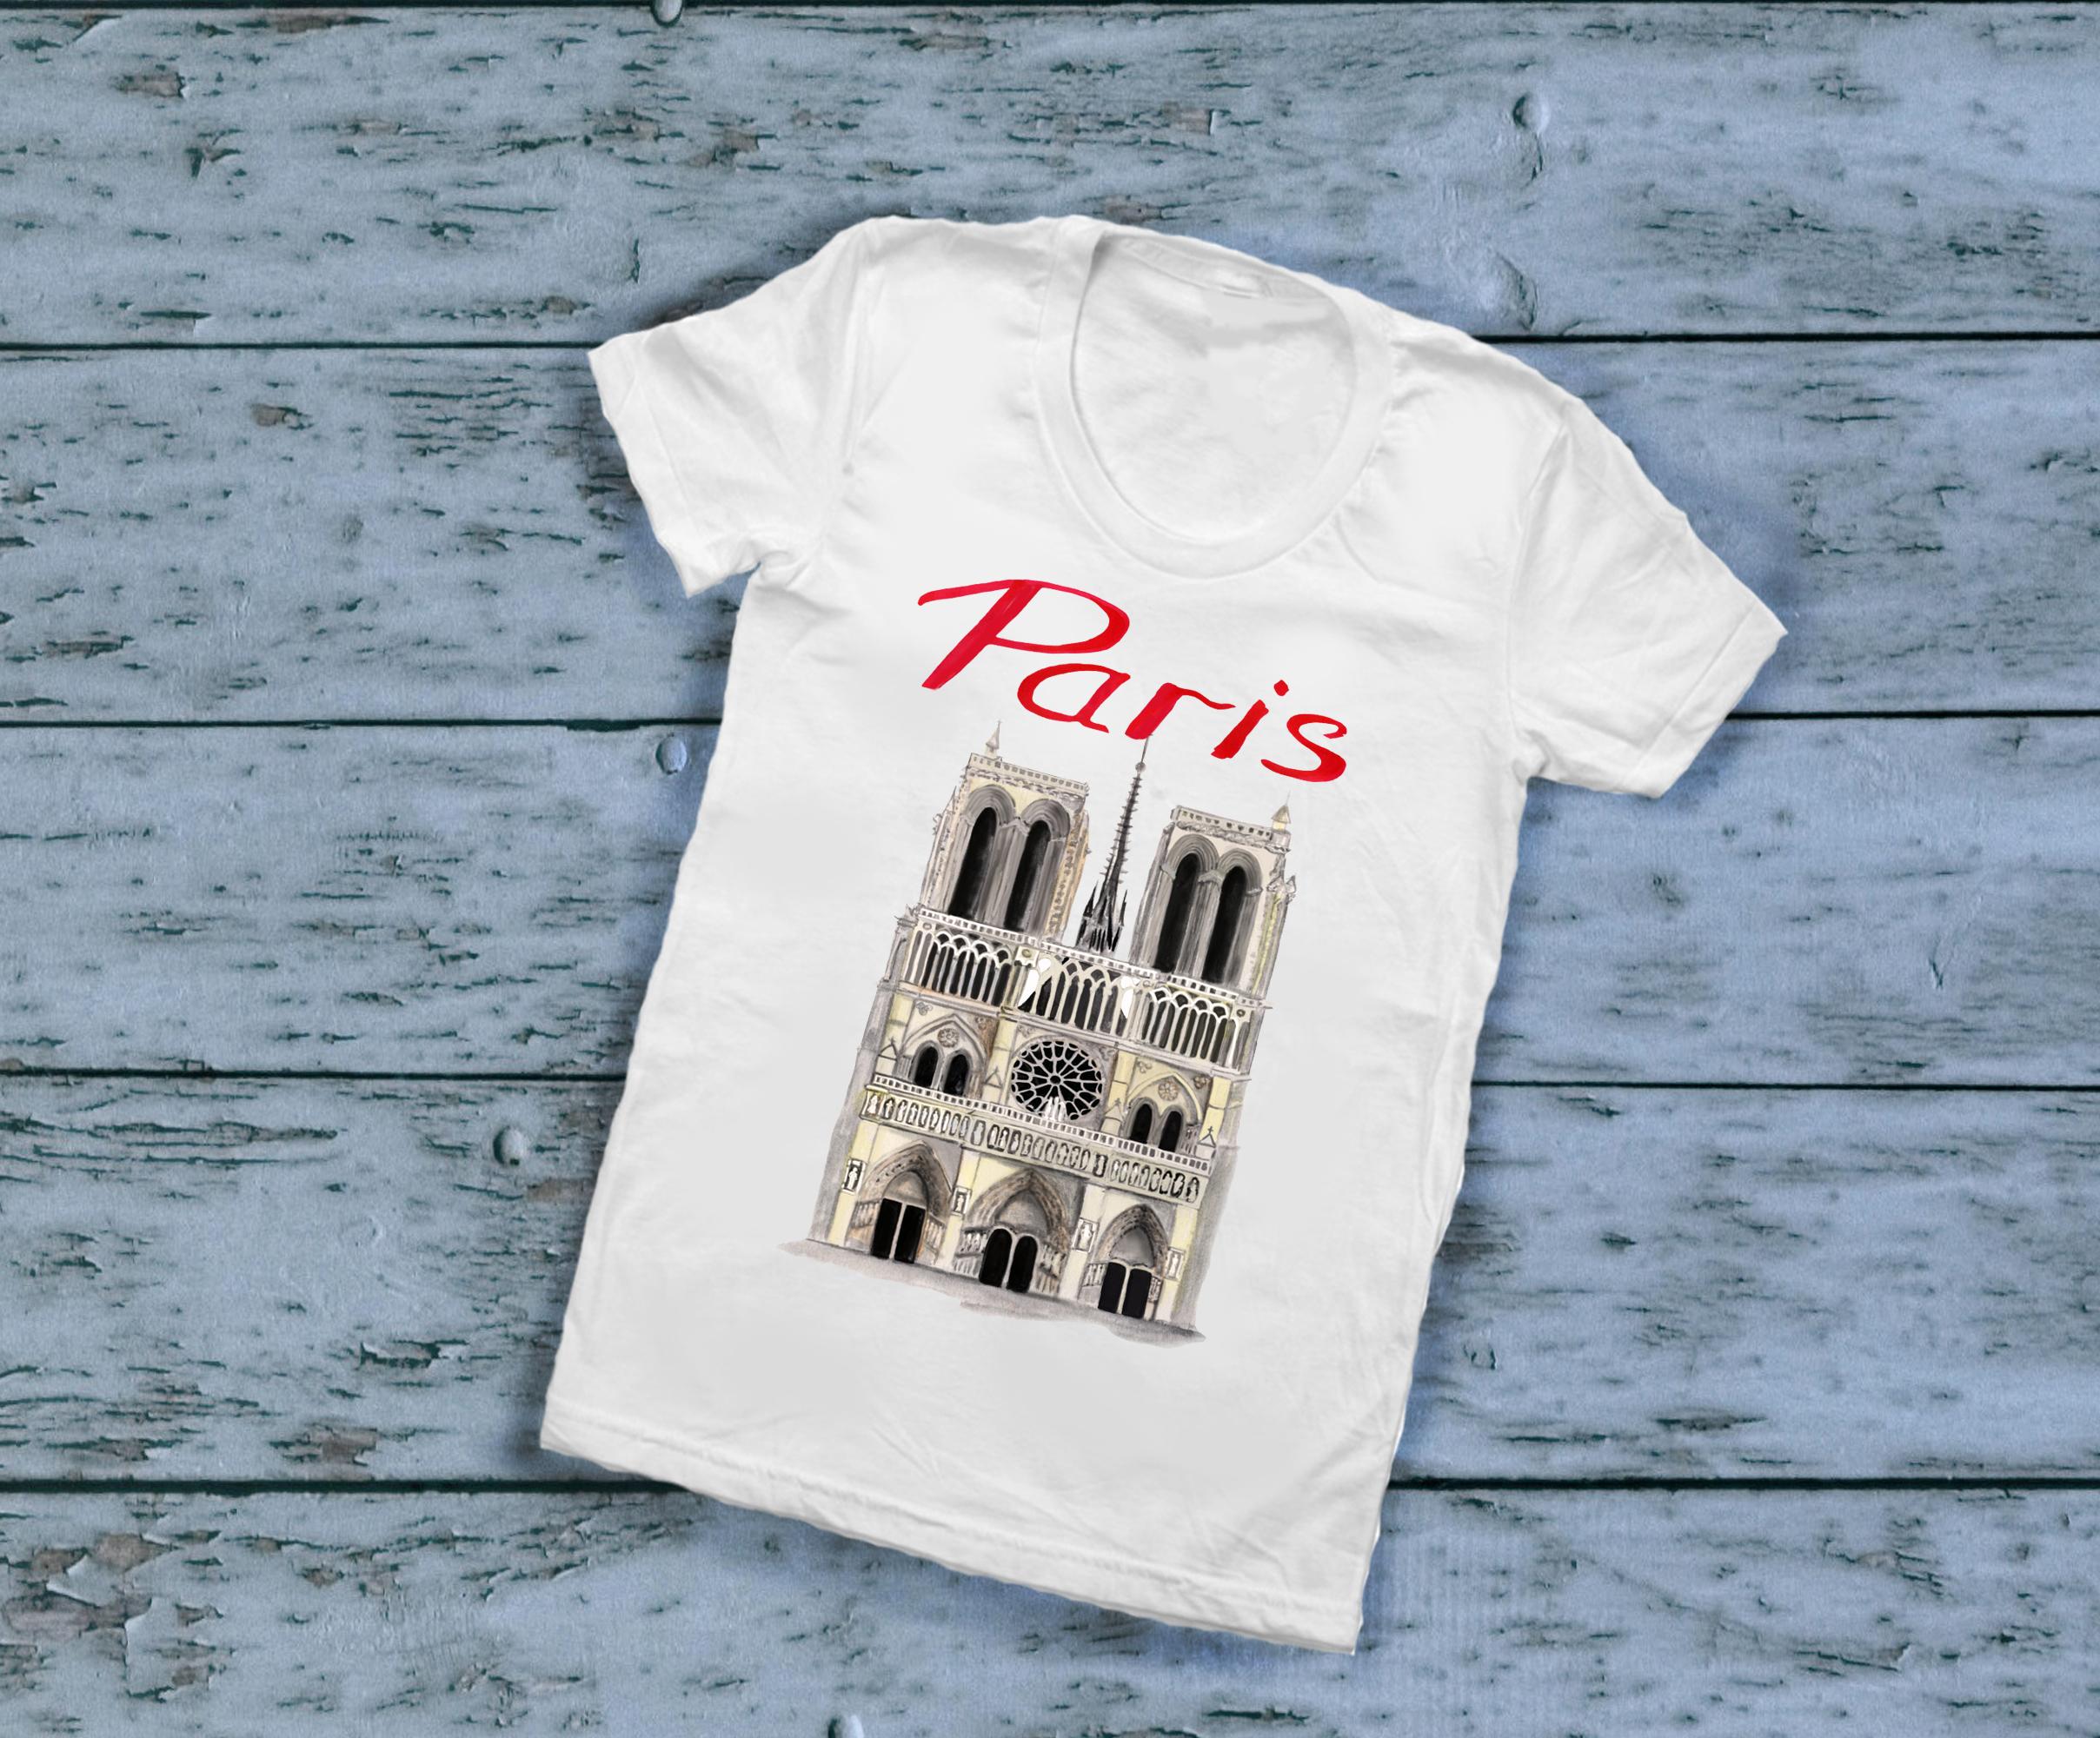 Paris clipart, Notre Dame, scooter clipart, eiffel tower example image 3